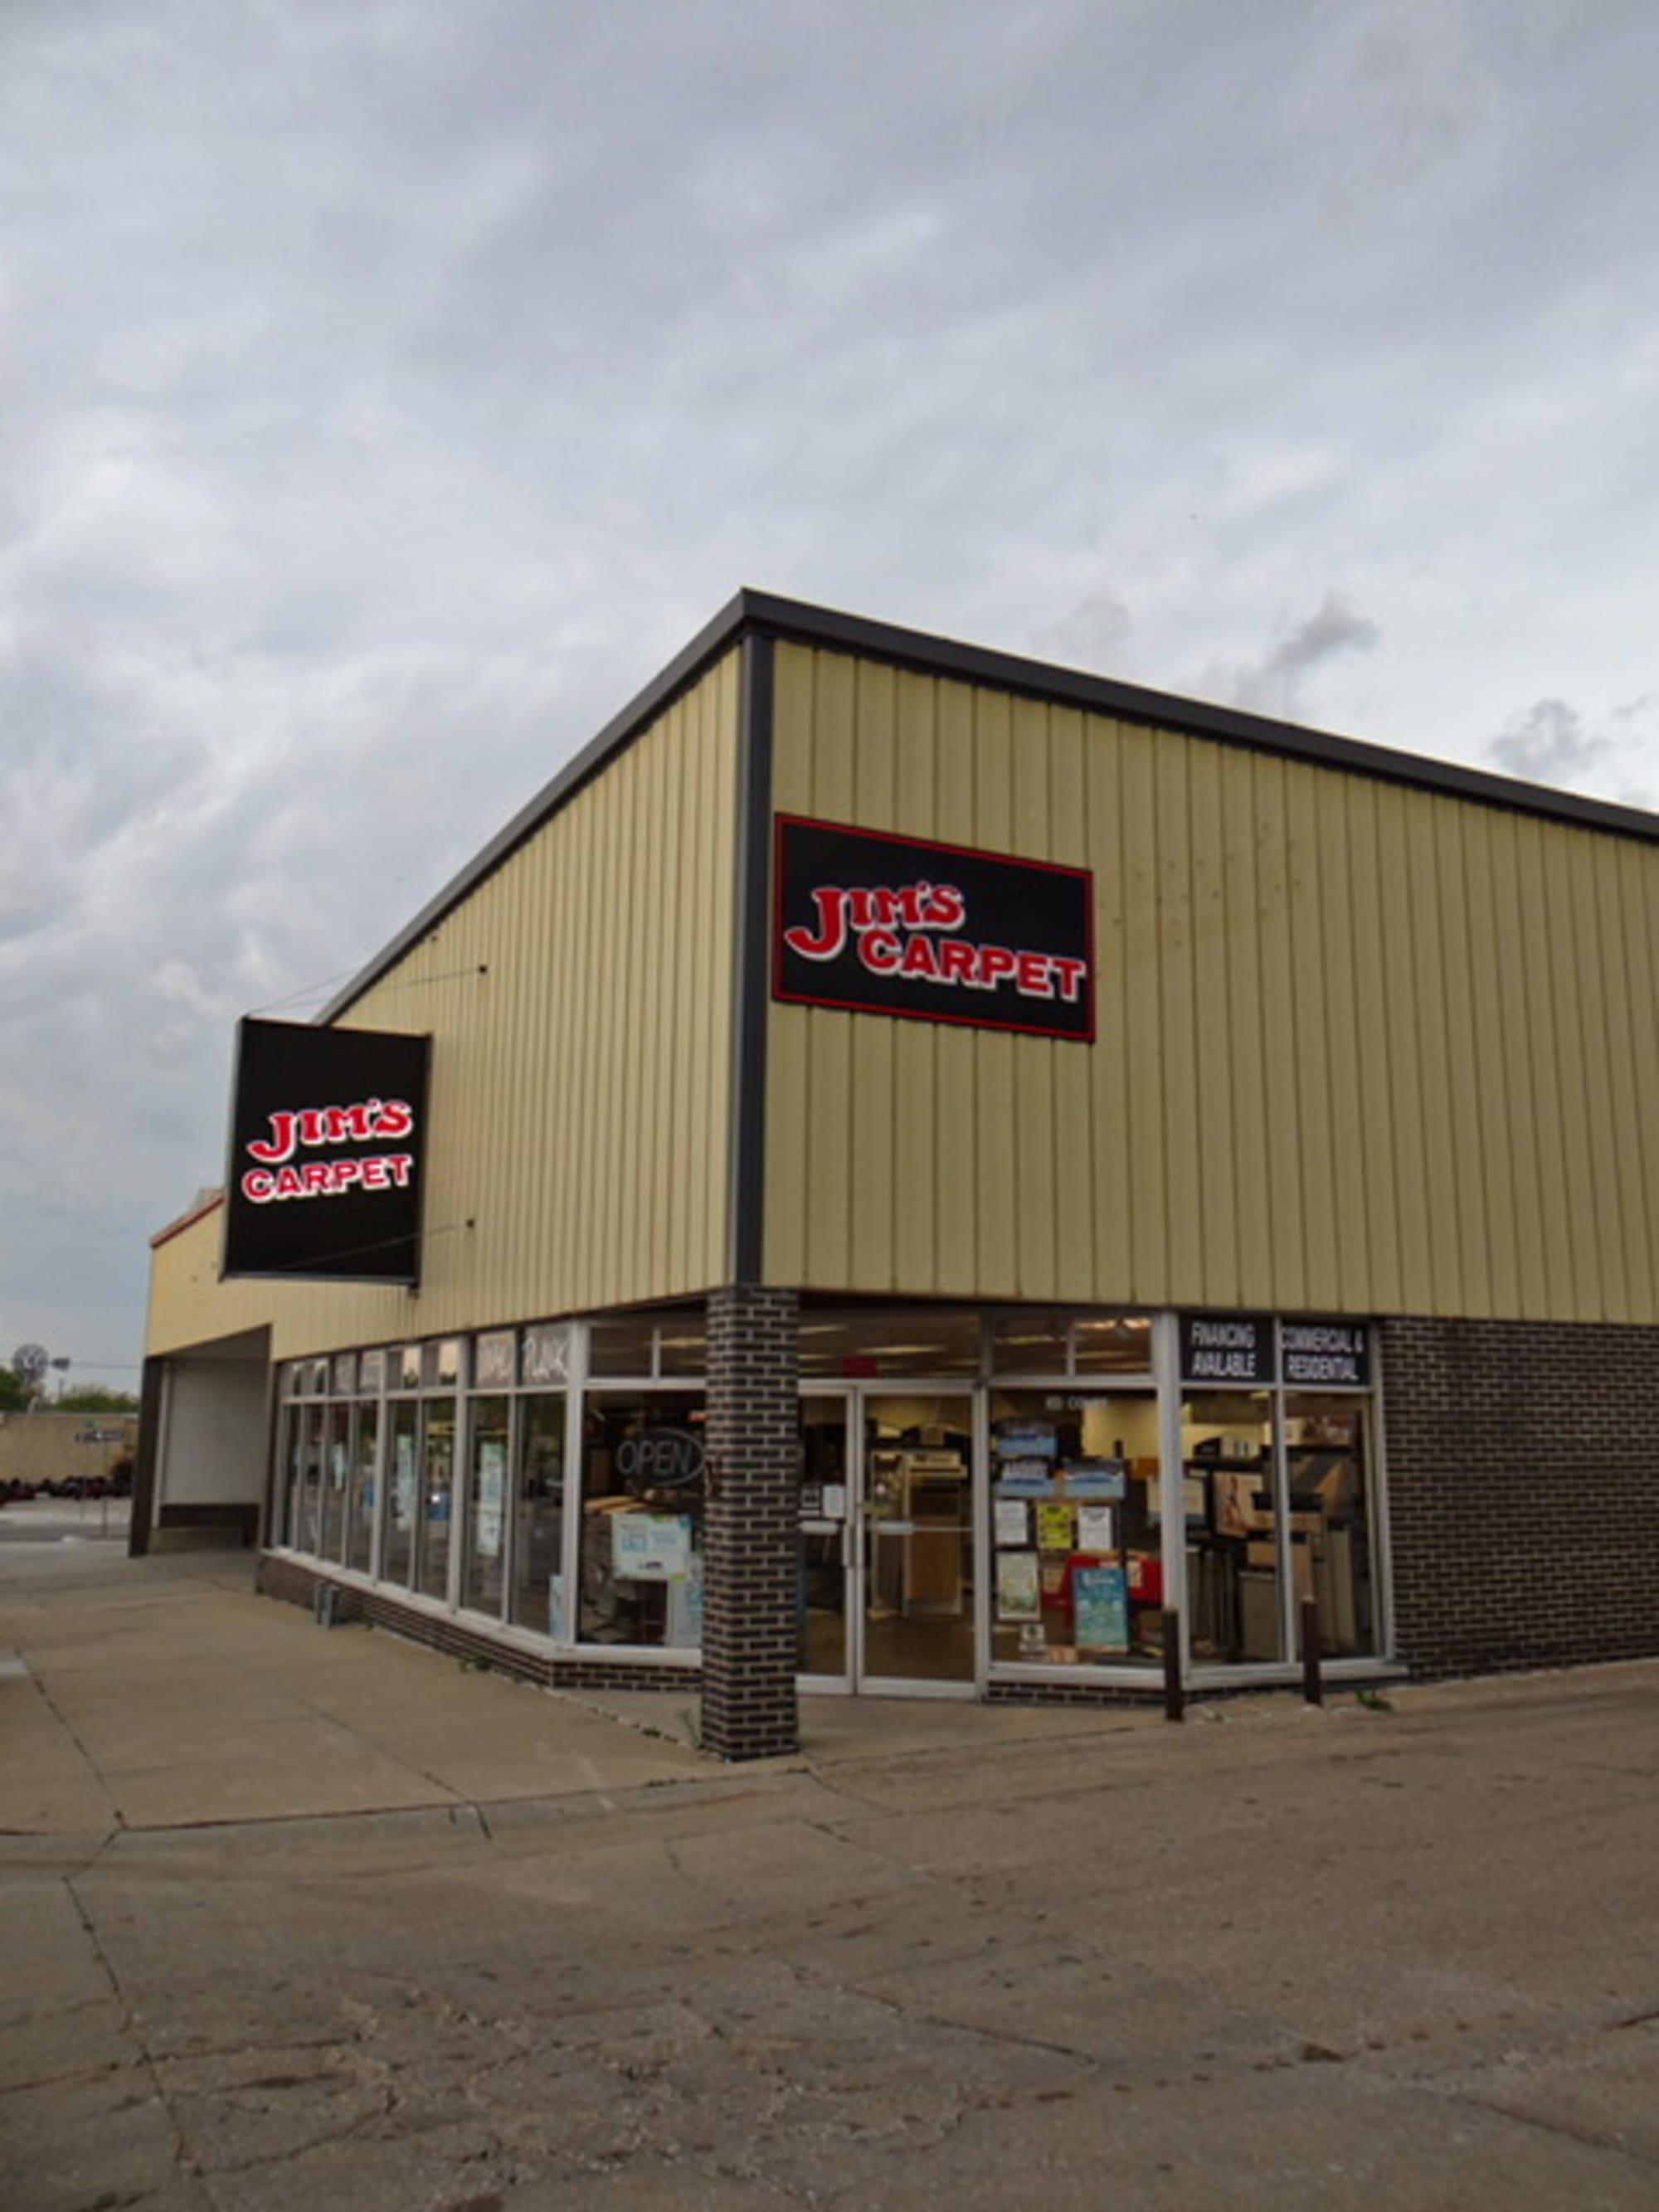 Jim's Carpet & Supplies, Inc. - 308 Court St Beatrice, NE 68310